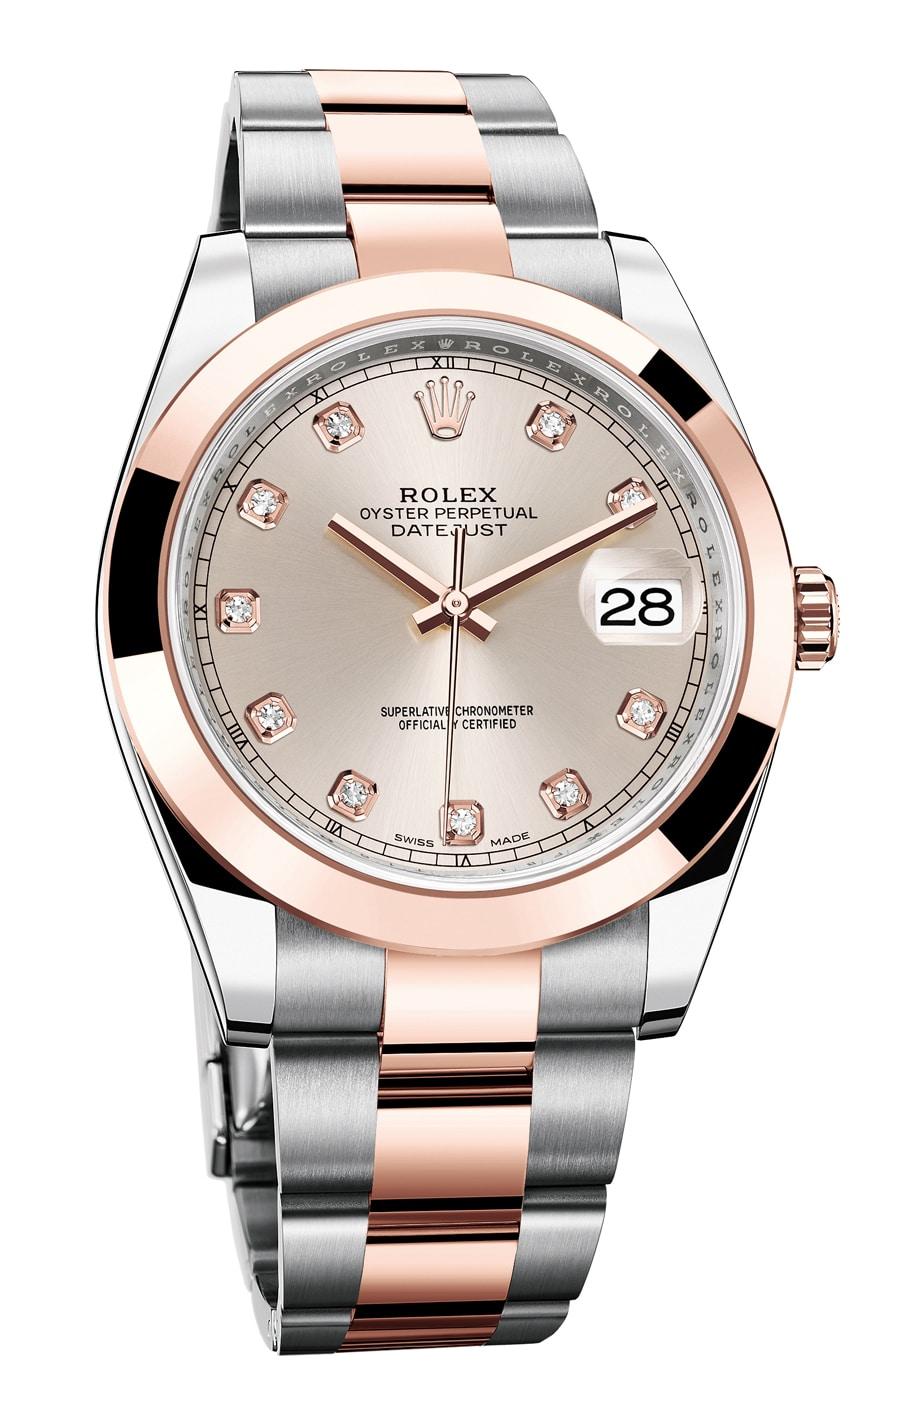 Rolex: Oyster Perpetual Datejust 41 in der Rosé-Diamant-Version